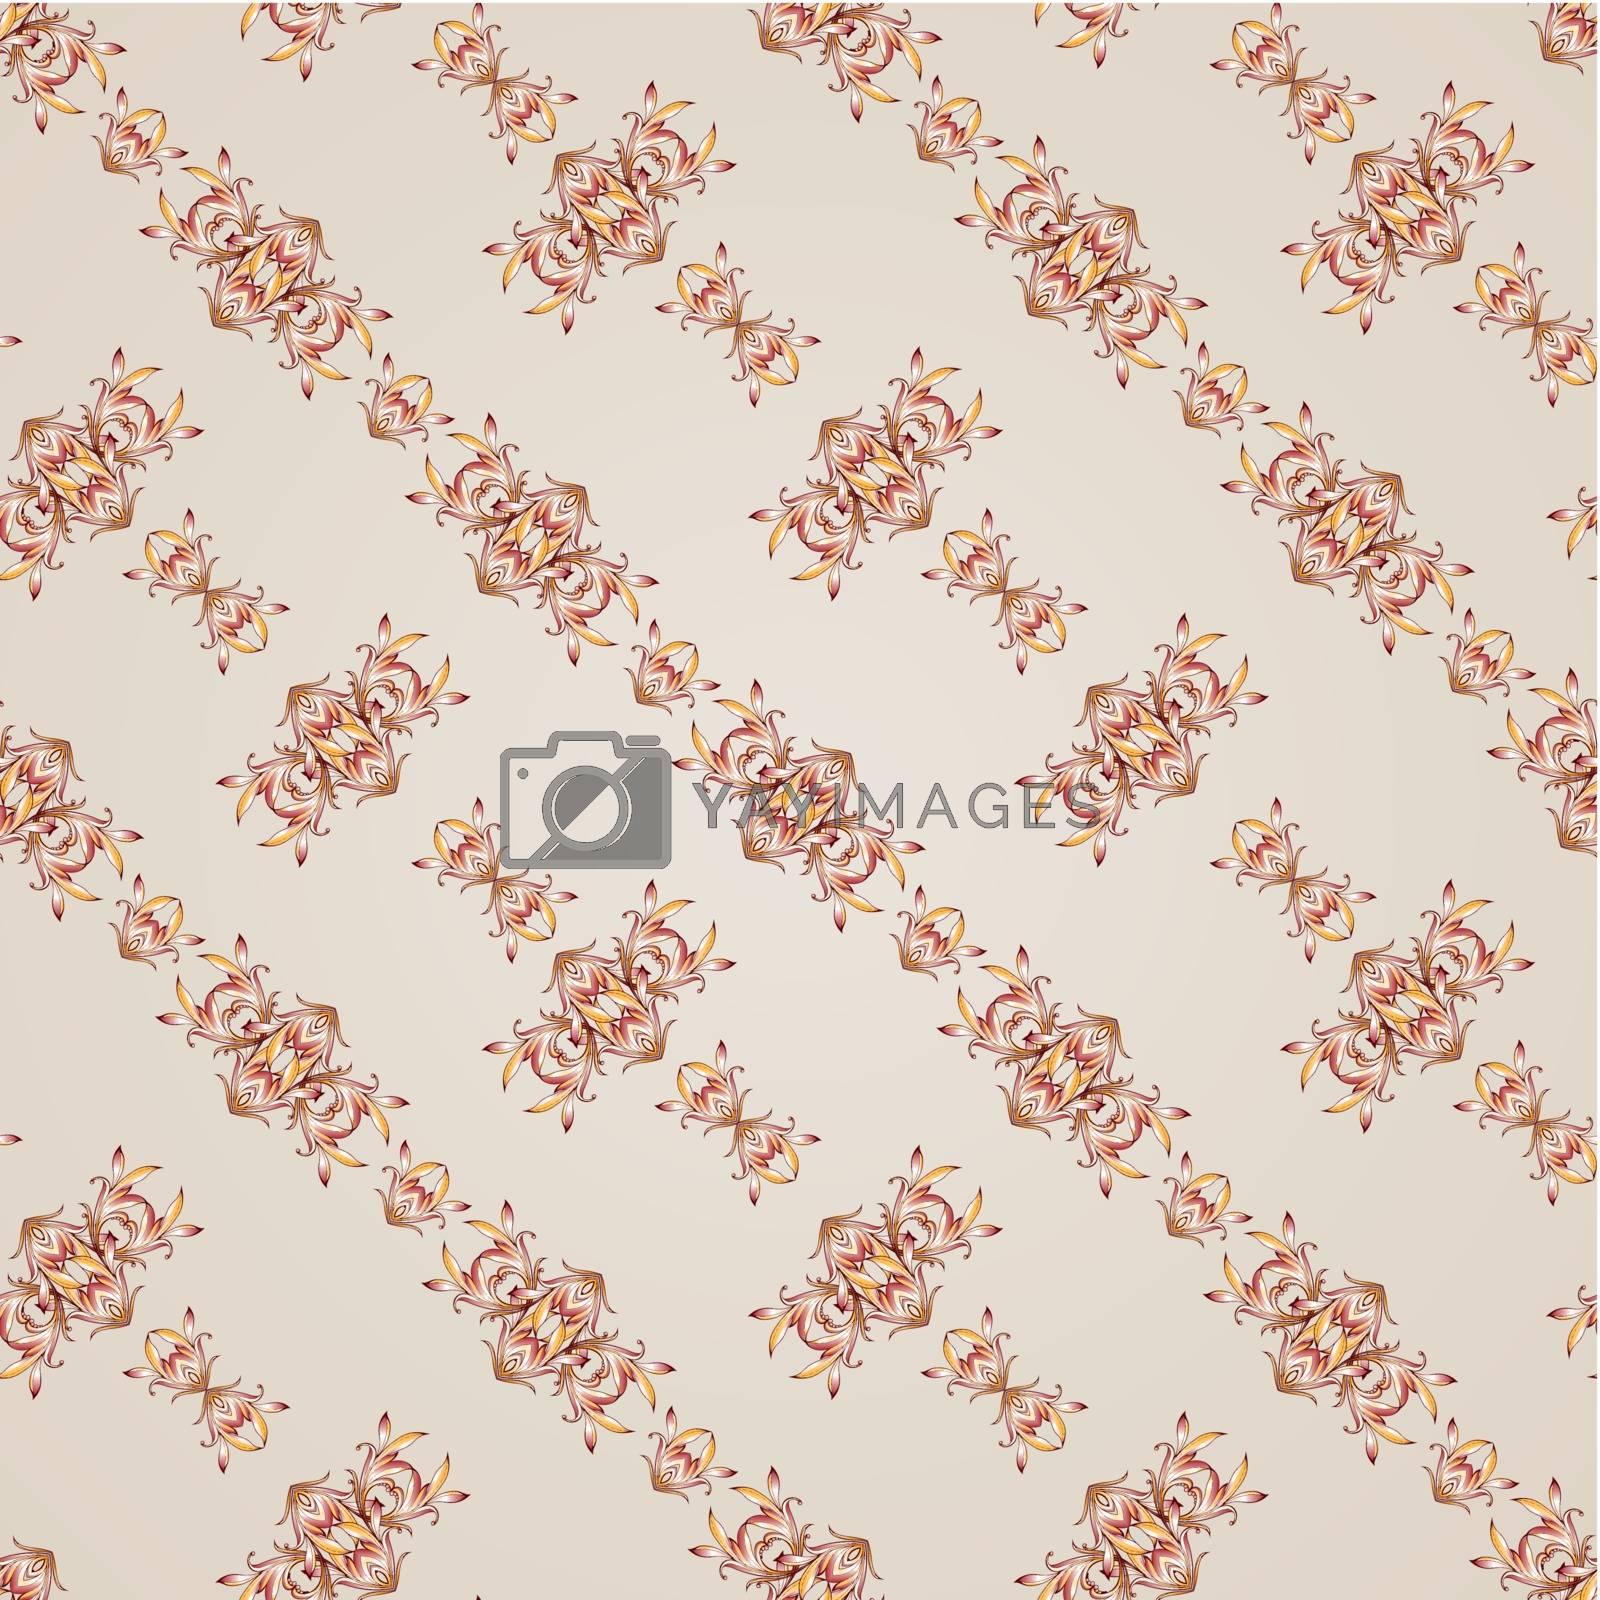 Diagonal seamless floral pattern on  light beige background